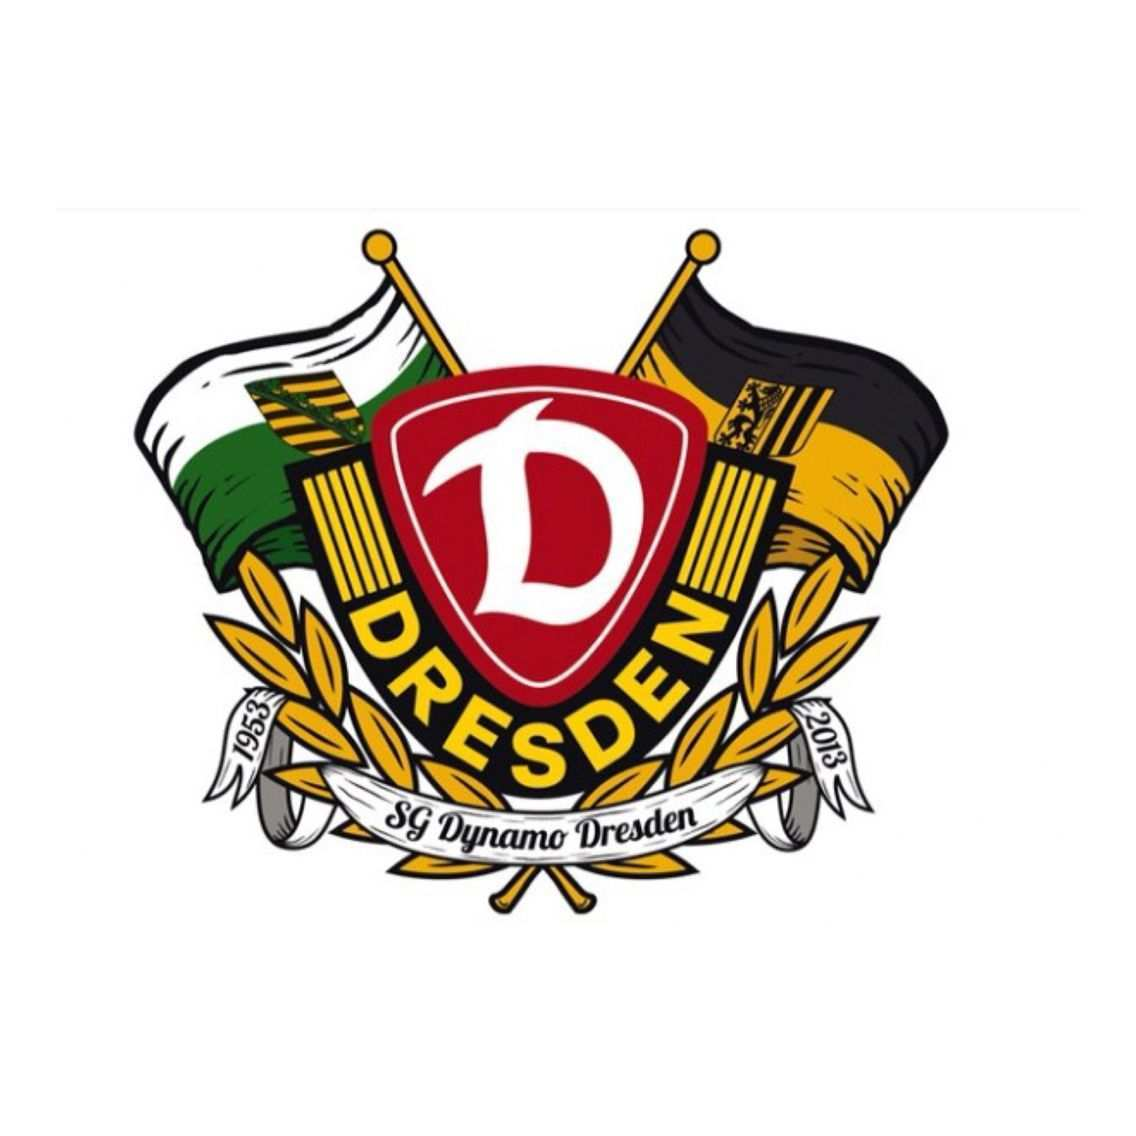 Dynamo Dresden Dynamo Dresden Dresden Dynamo